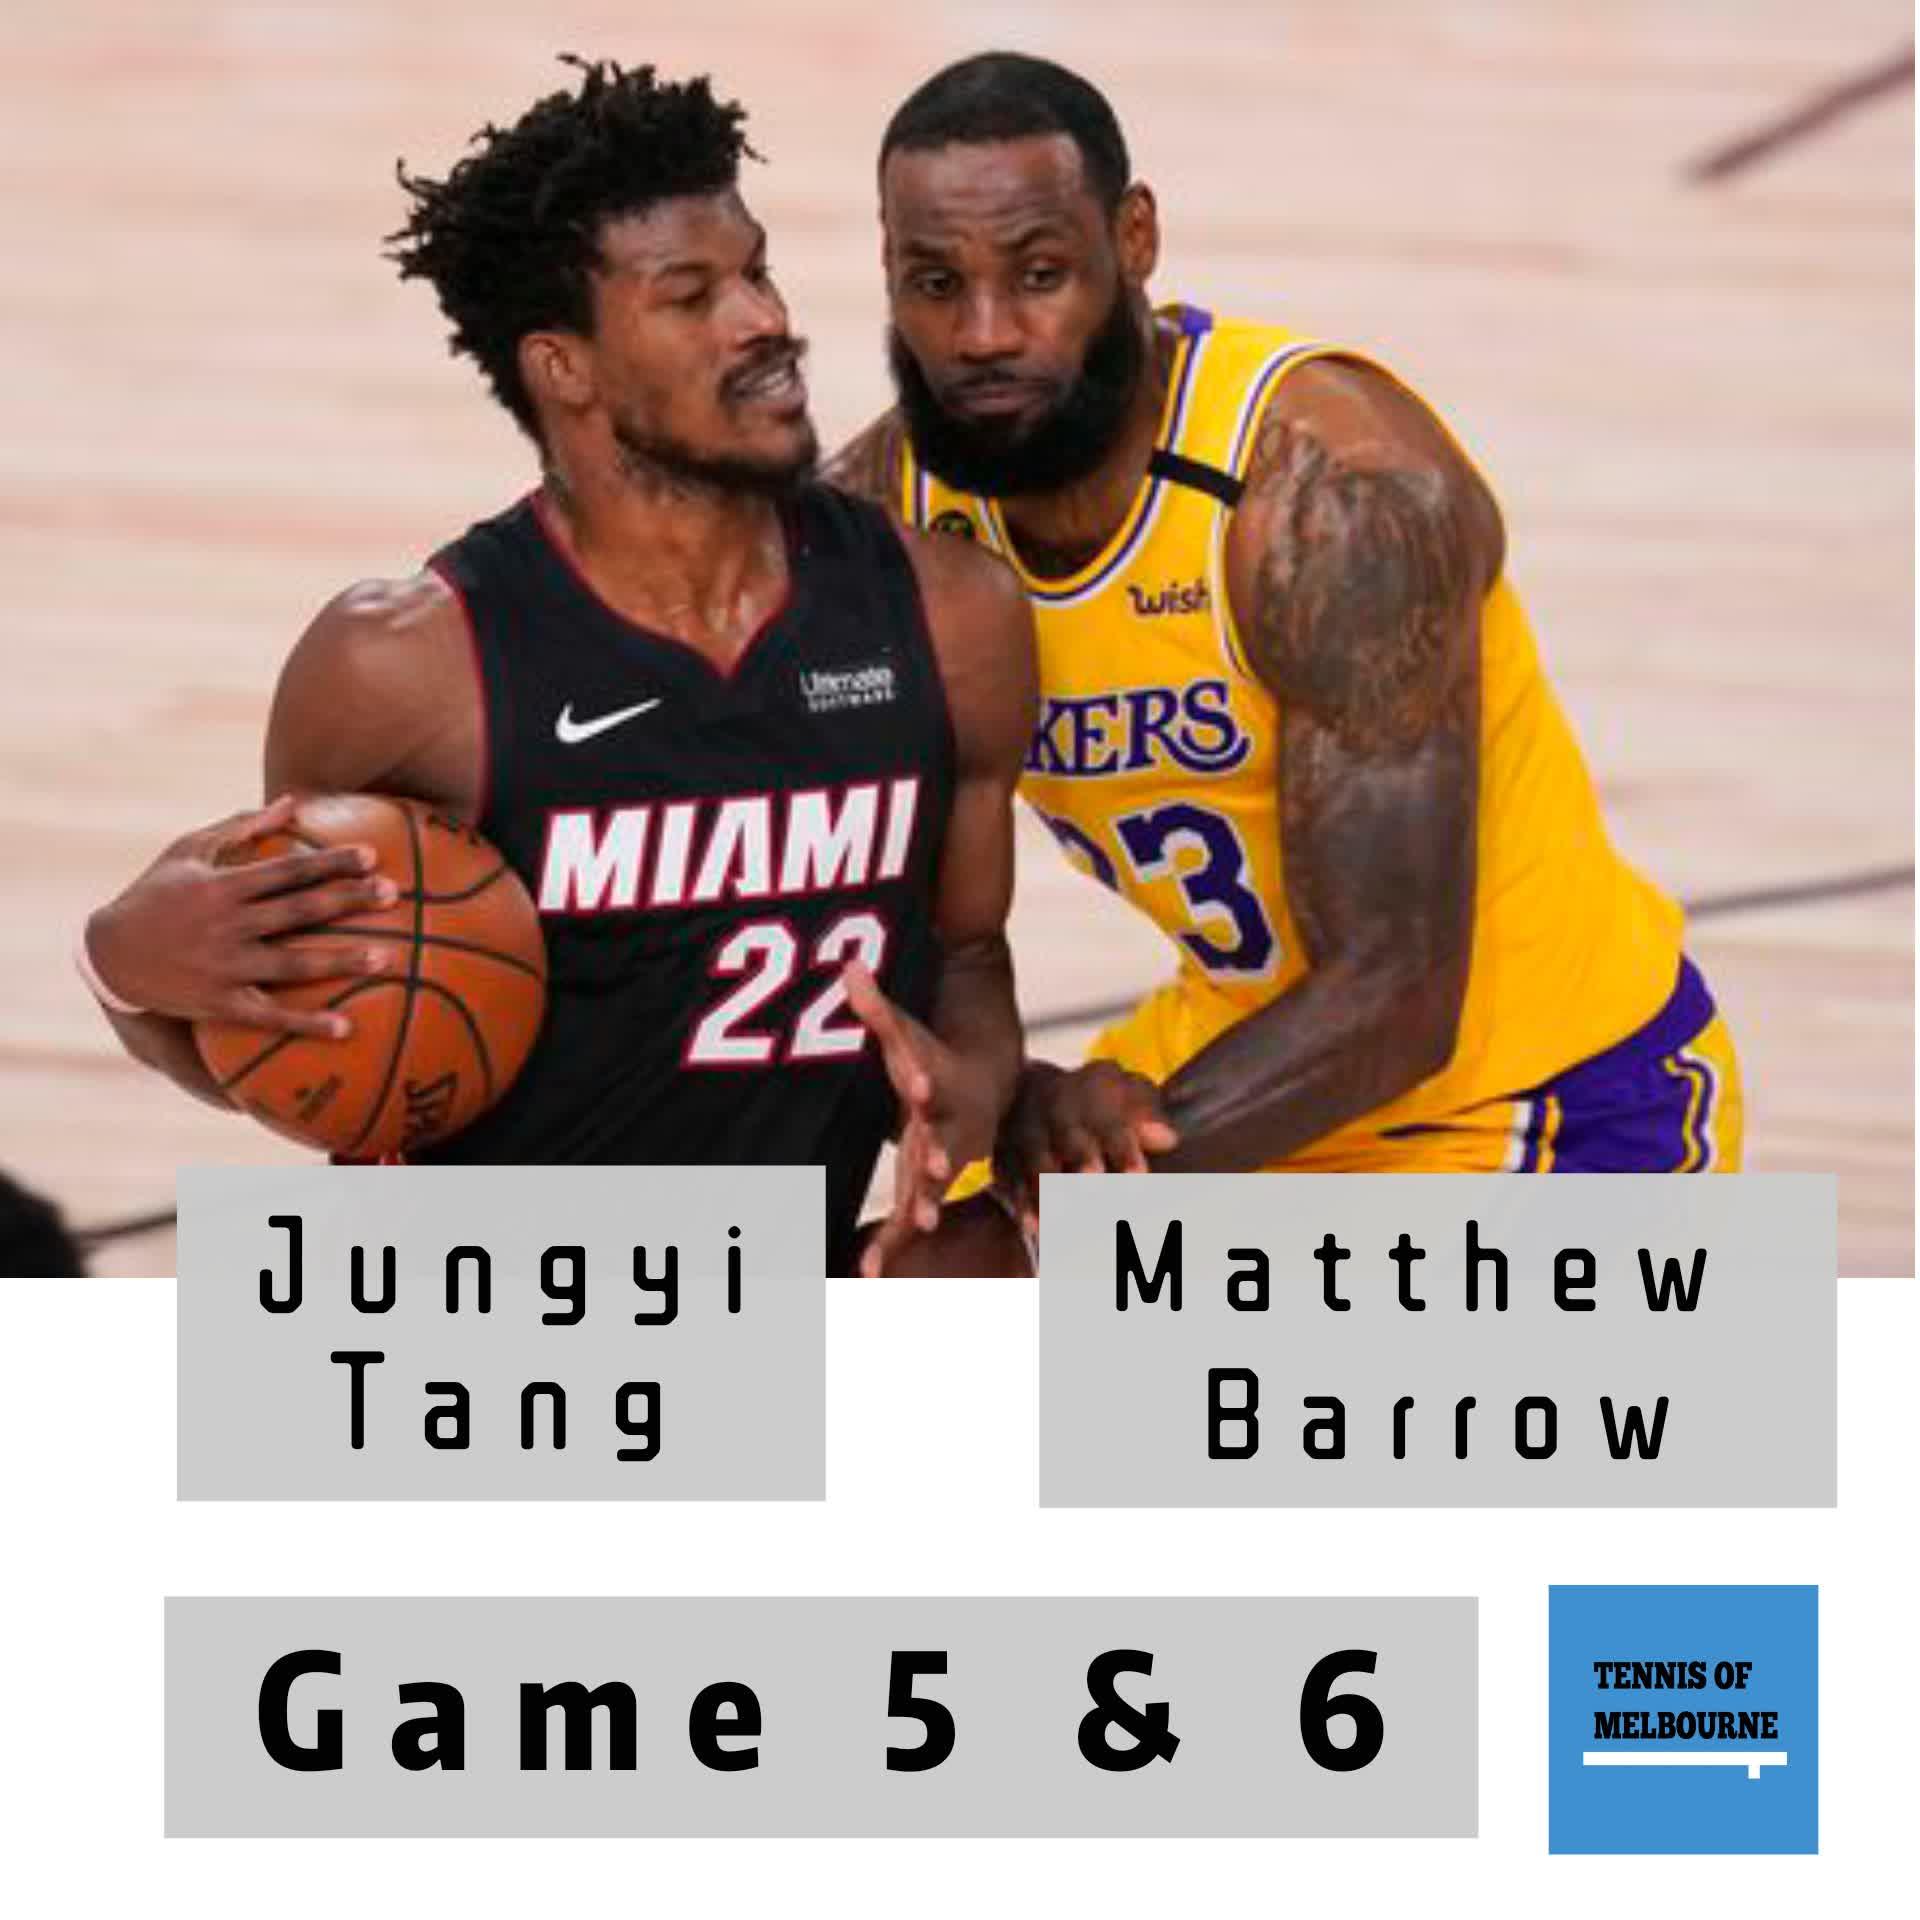 #184 NBA Finals | Jungyi Tang & Matthew Barrow